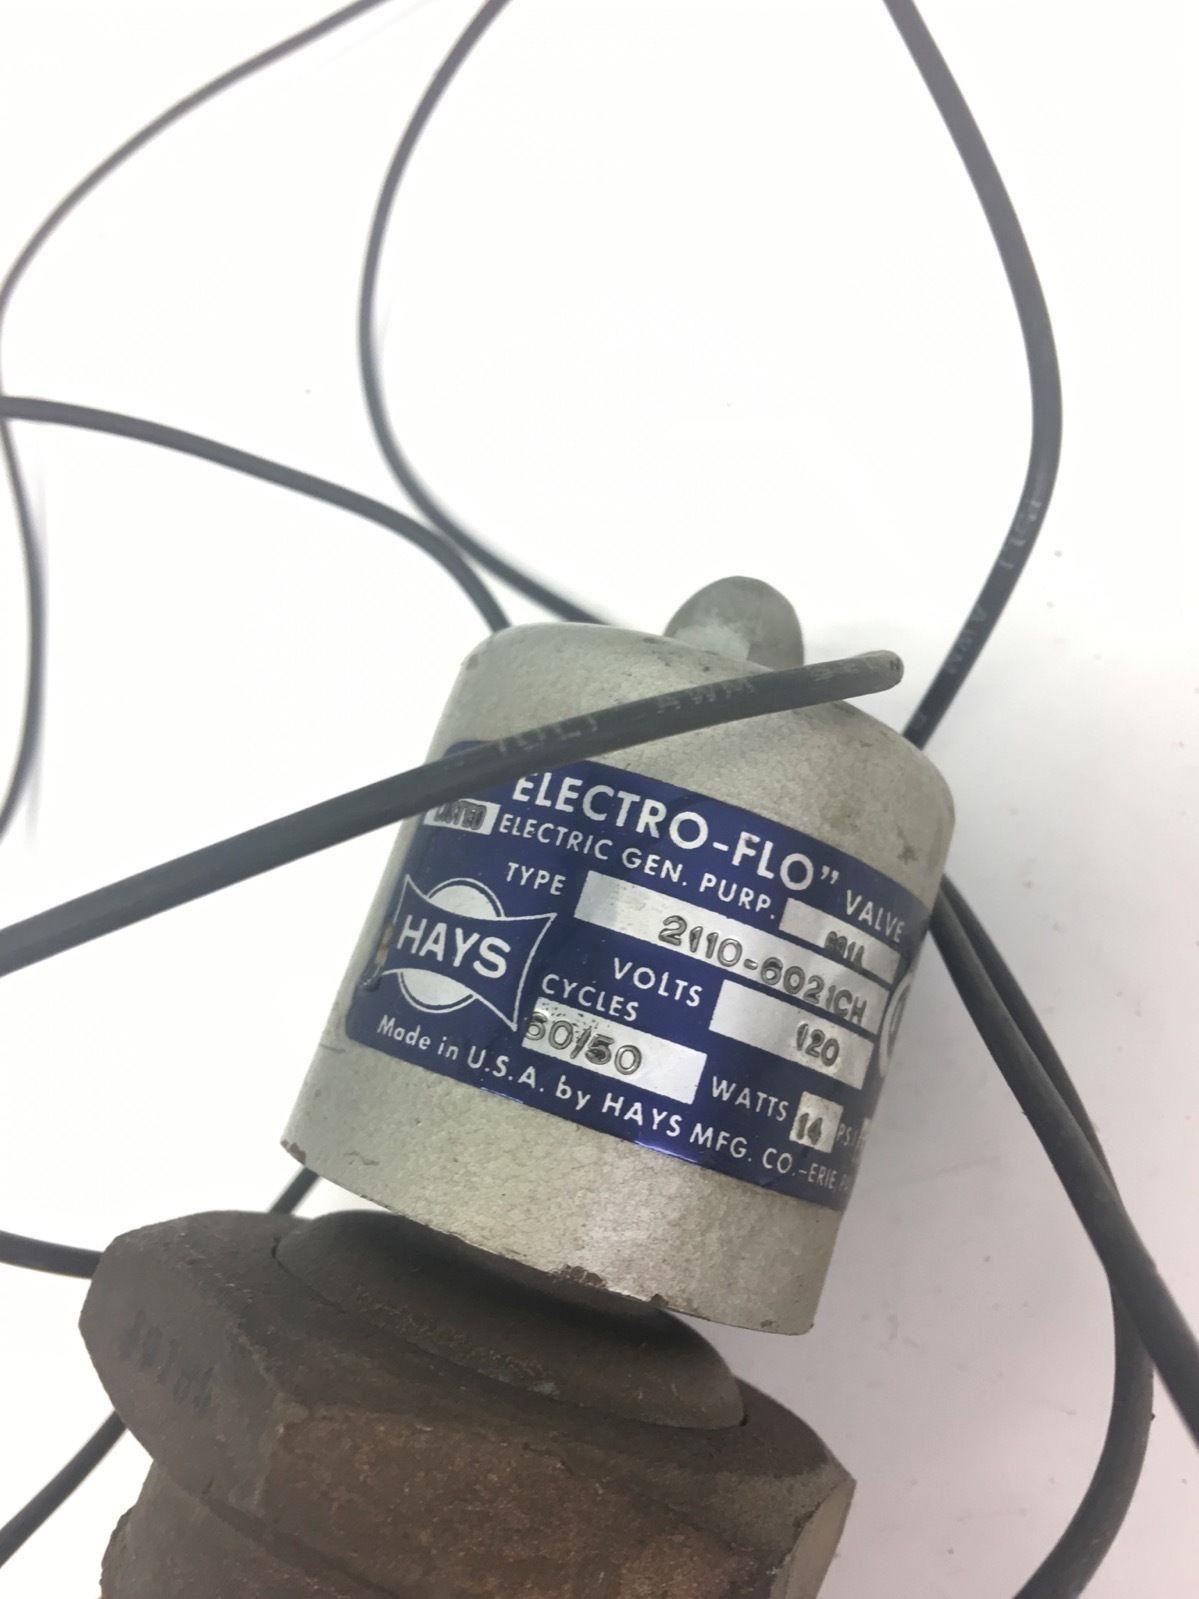 NEW Hays 2110-6021CH Electro-Flo Solenoid Valve 120VAC, 14 WATTS, 50 PSI, F228 2